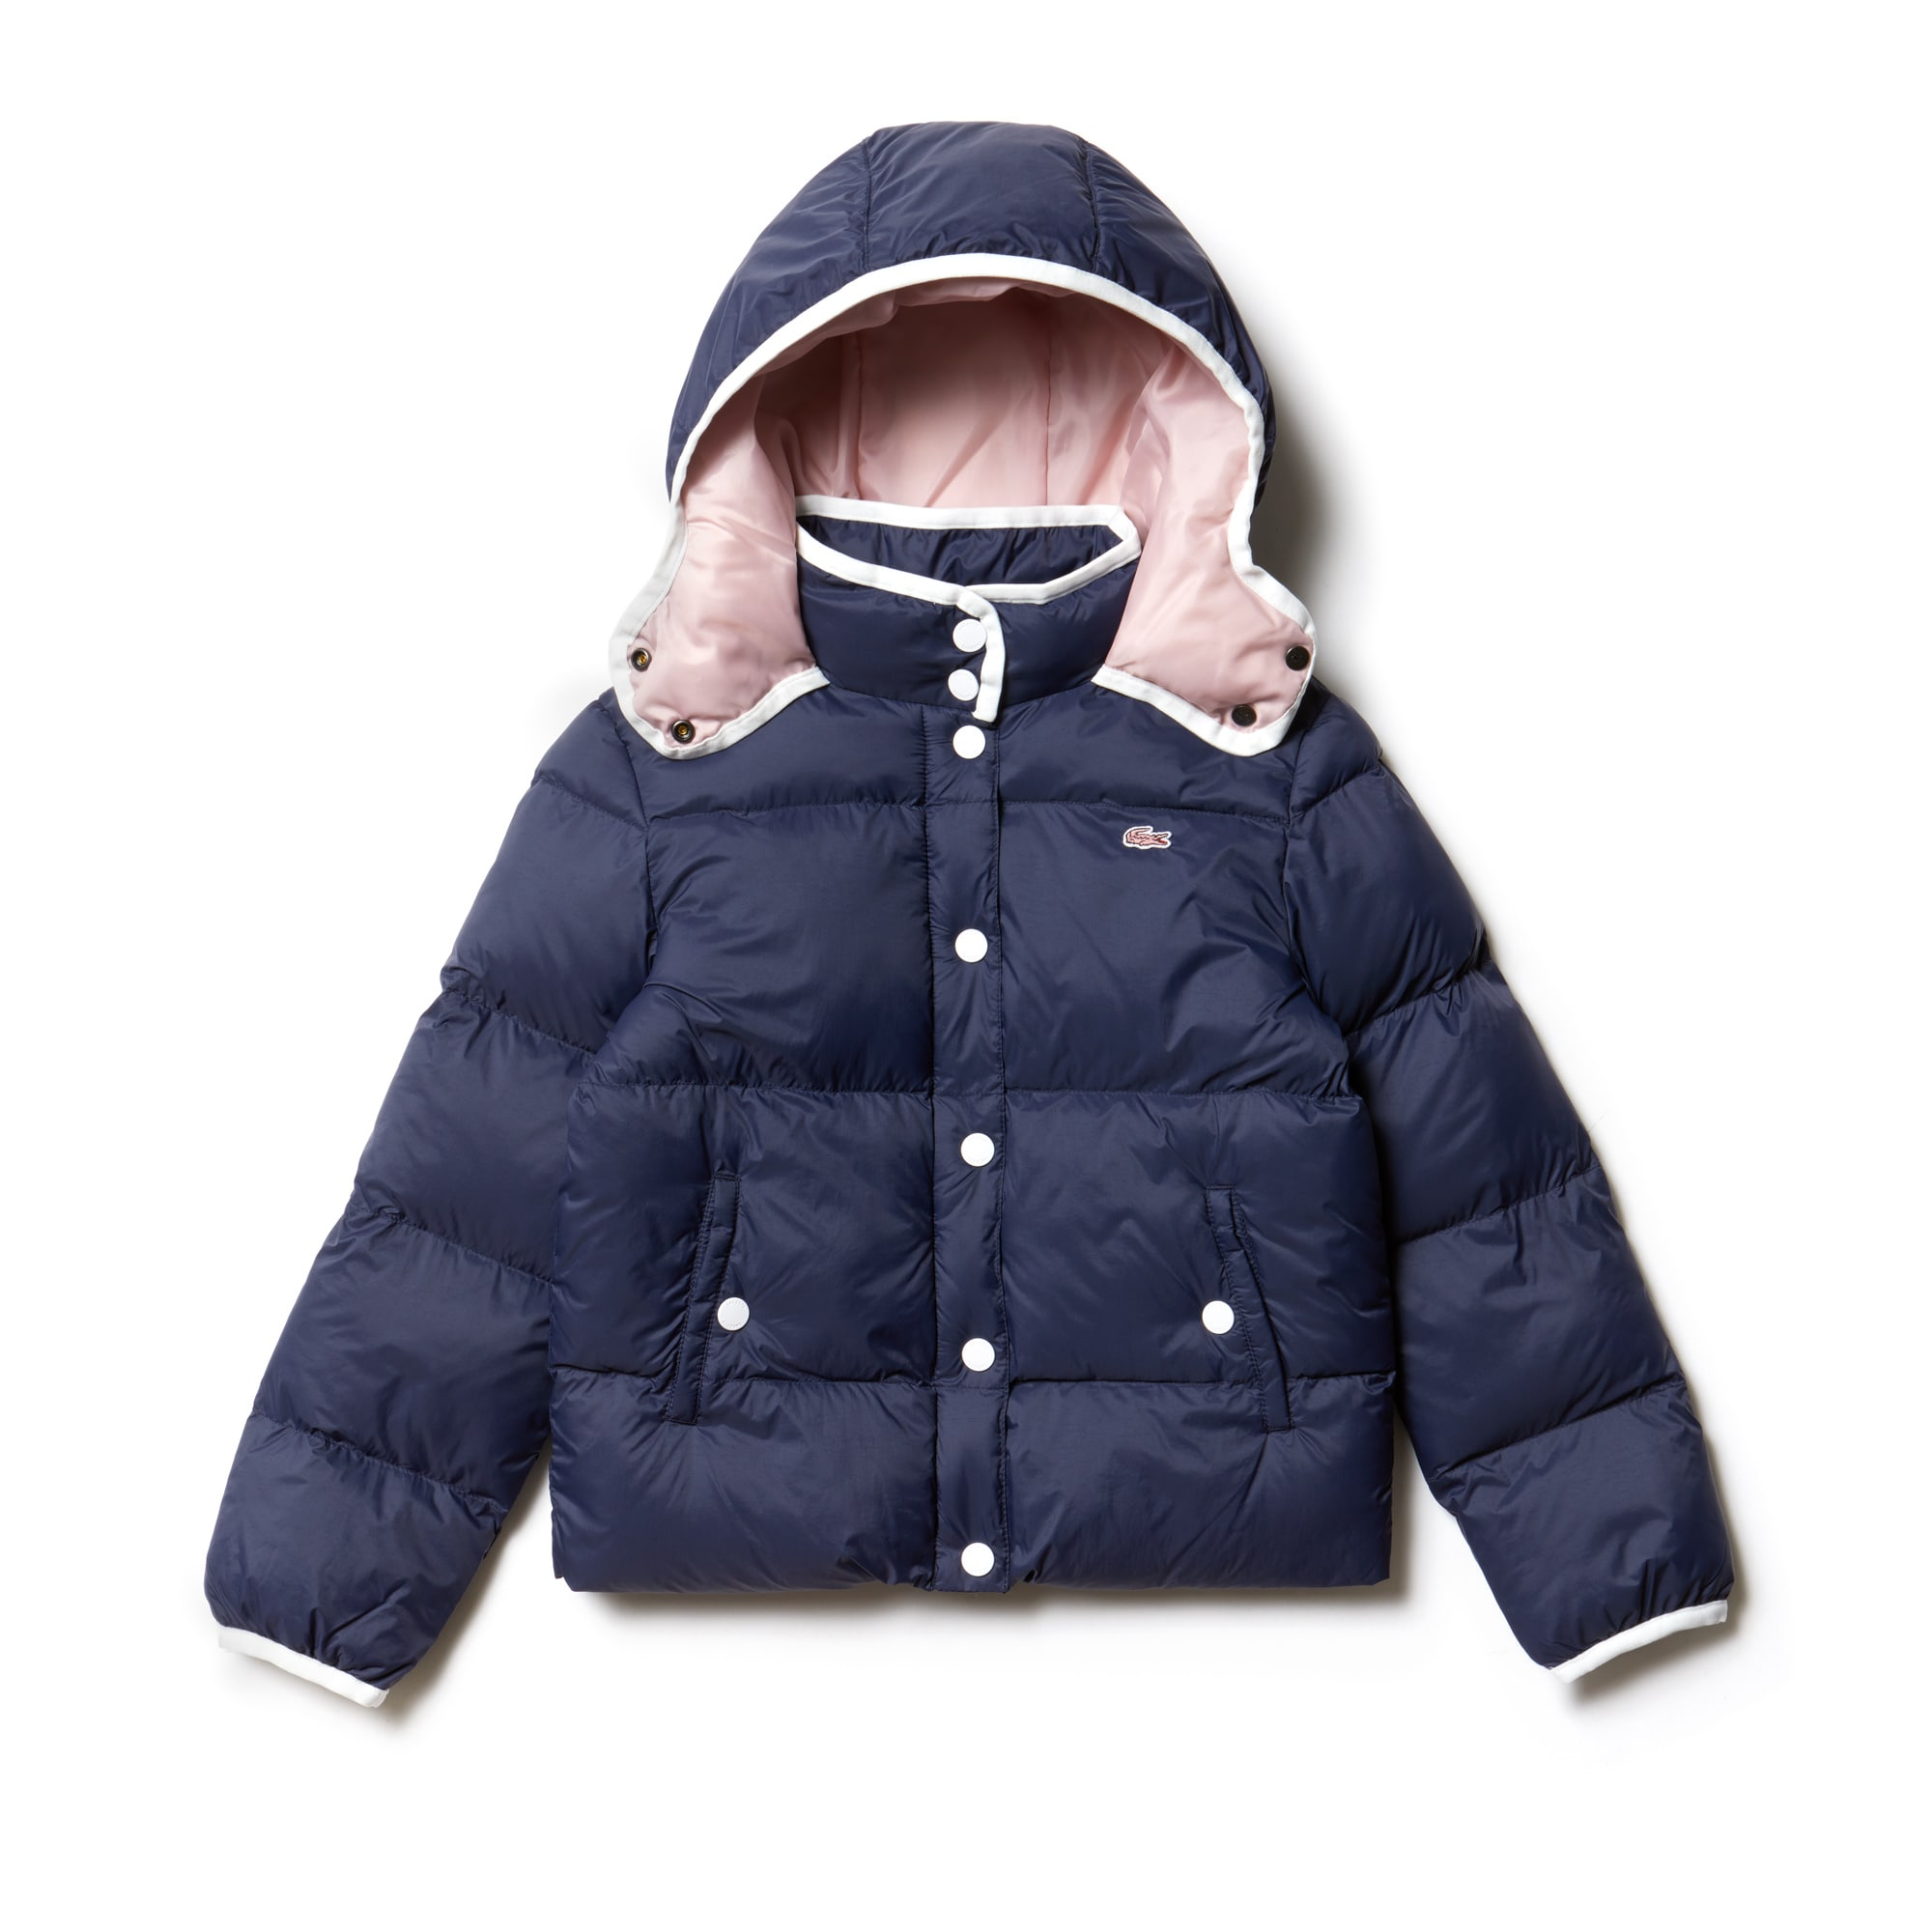 Girls' Hooded Down Jacket